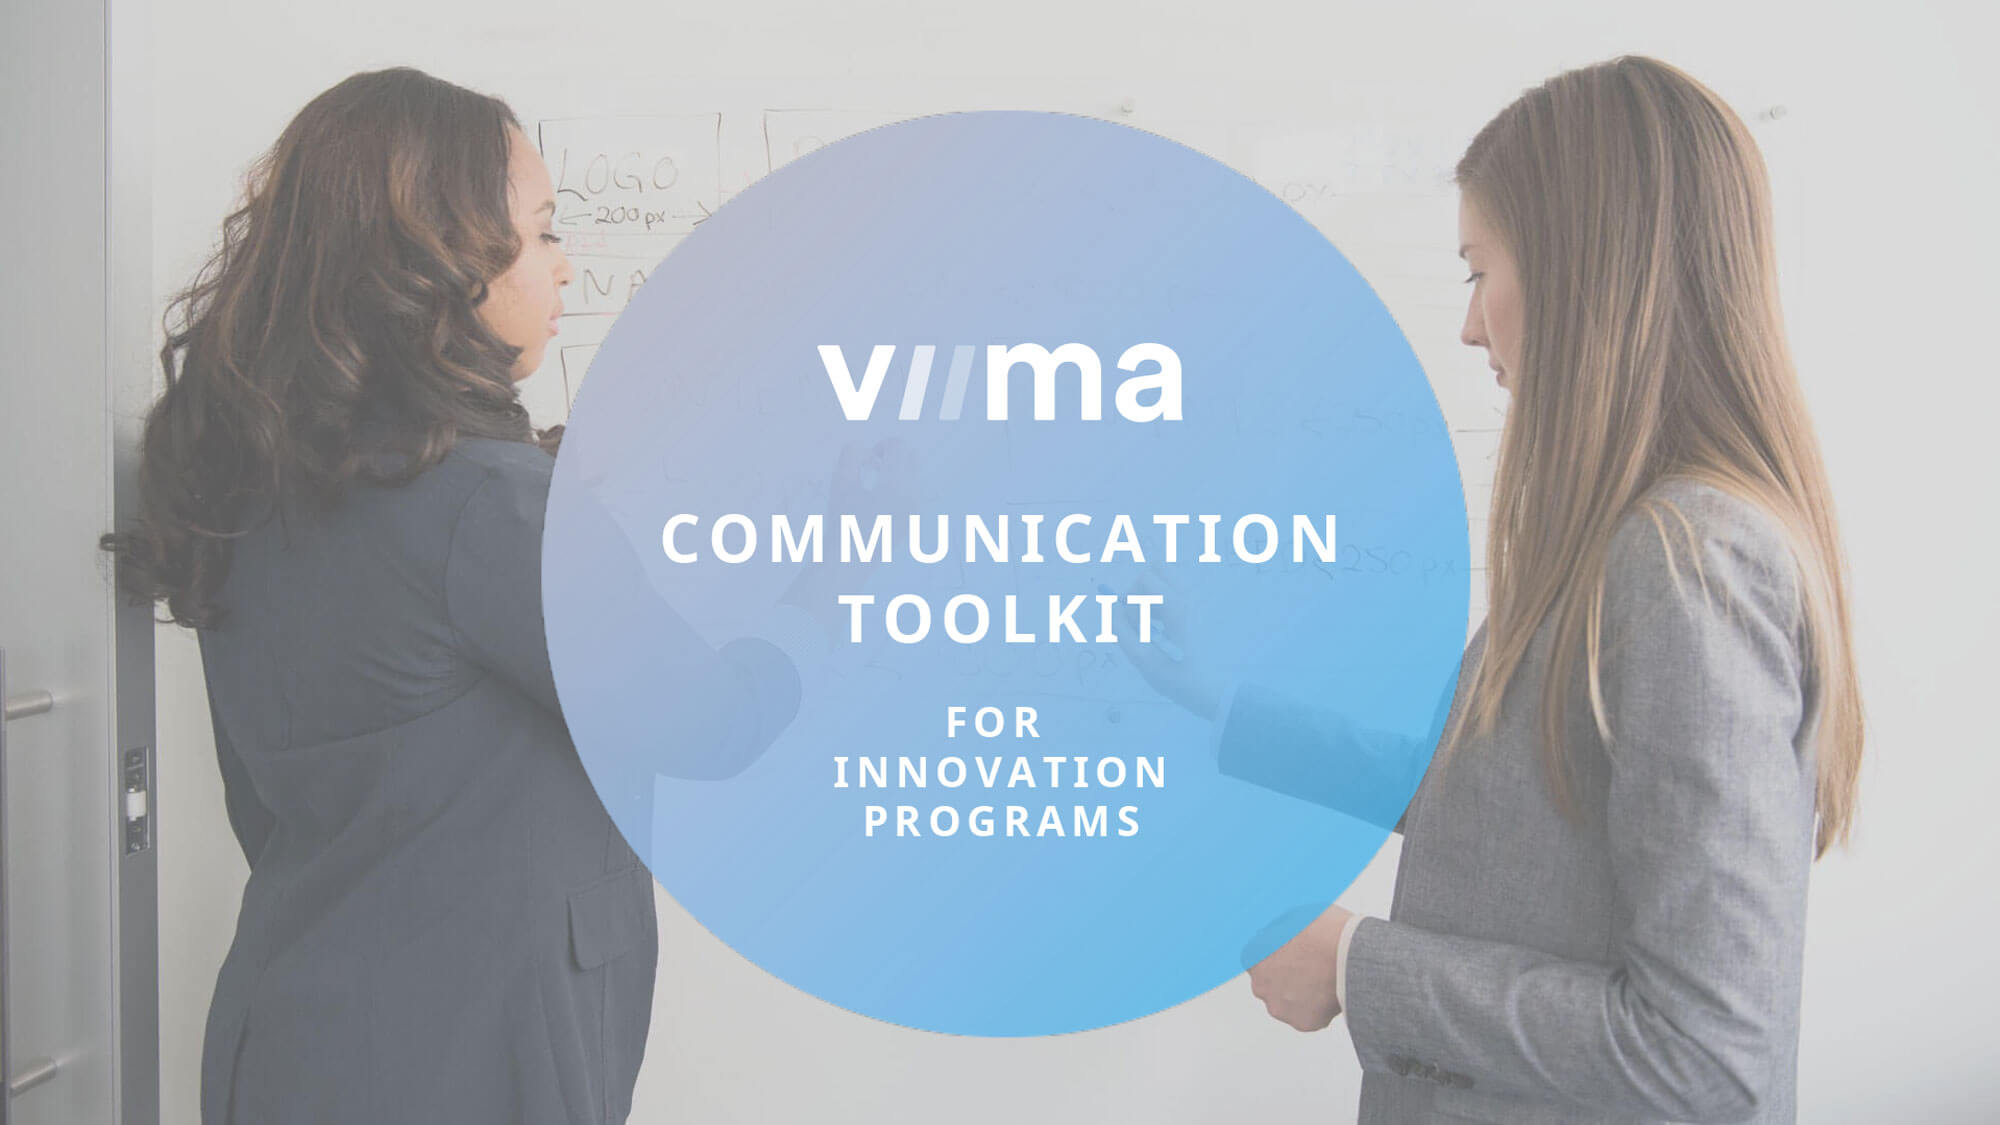 Viima Communication Toolkit